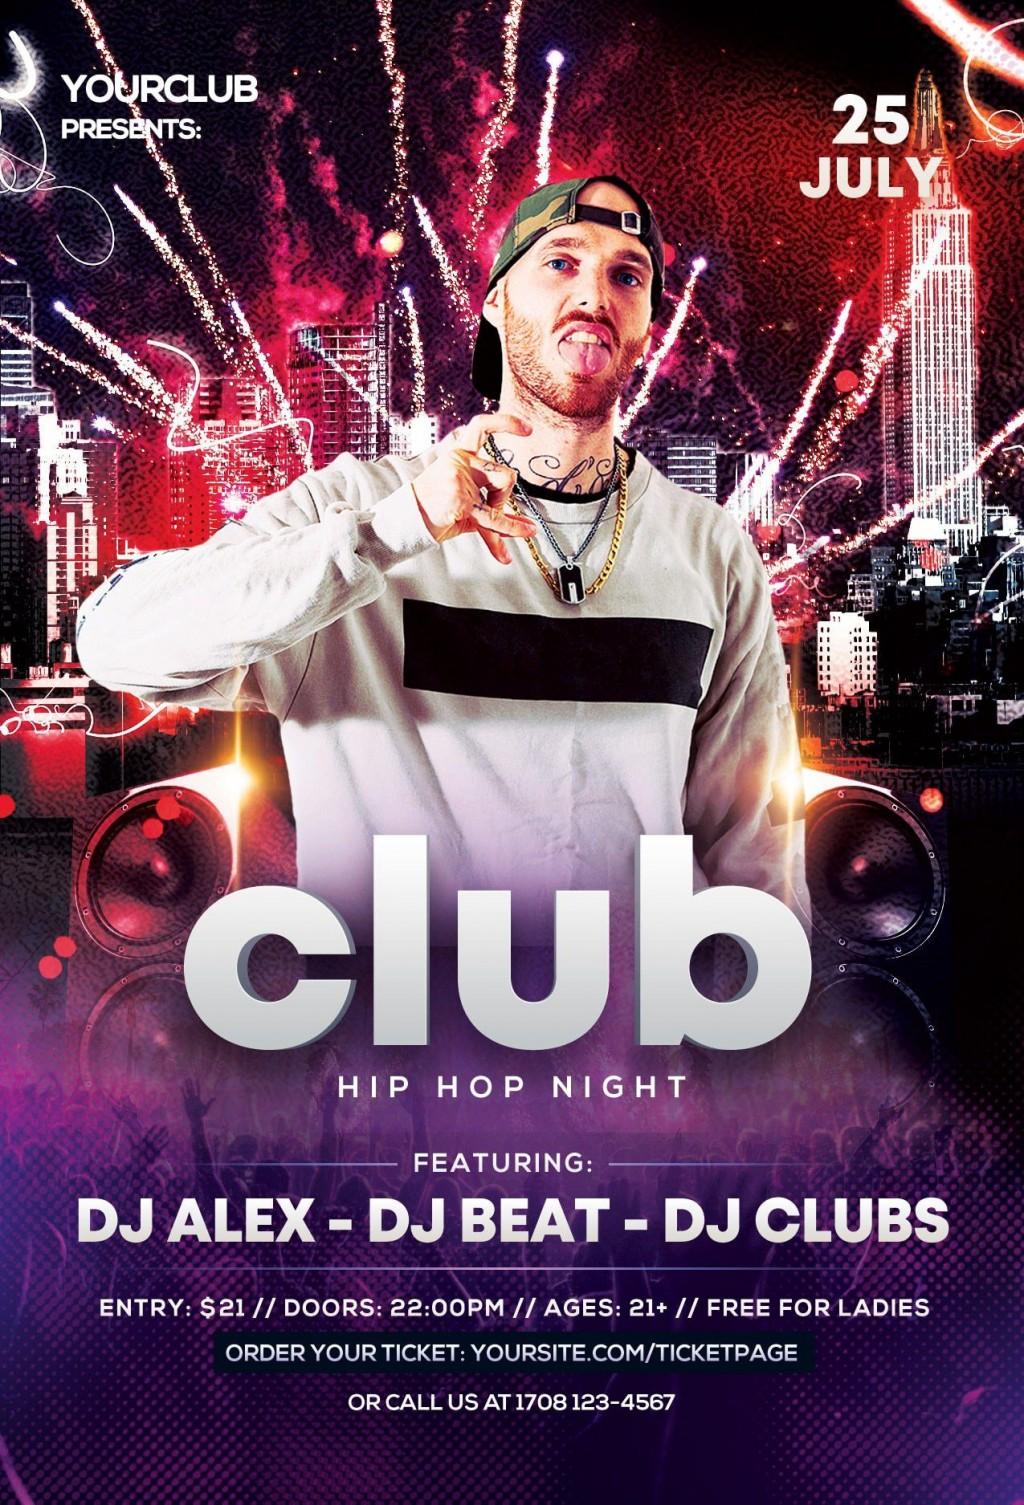 001 Marvelou Hip Hop Flyer Template Highest Clarity  Templates Hip-hop Party Free DownloadLarge